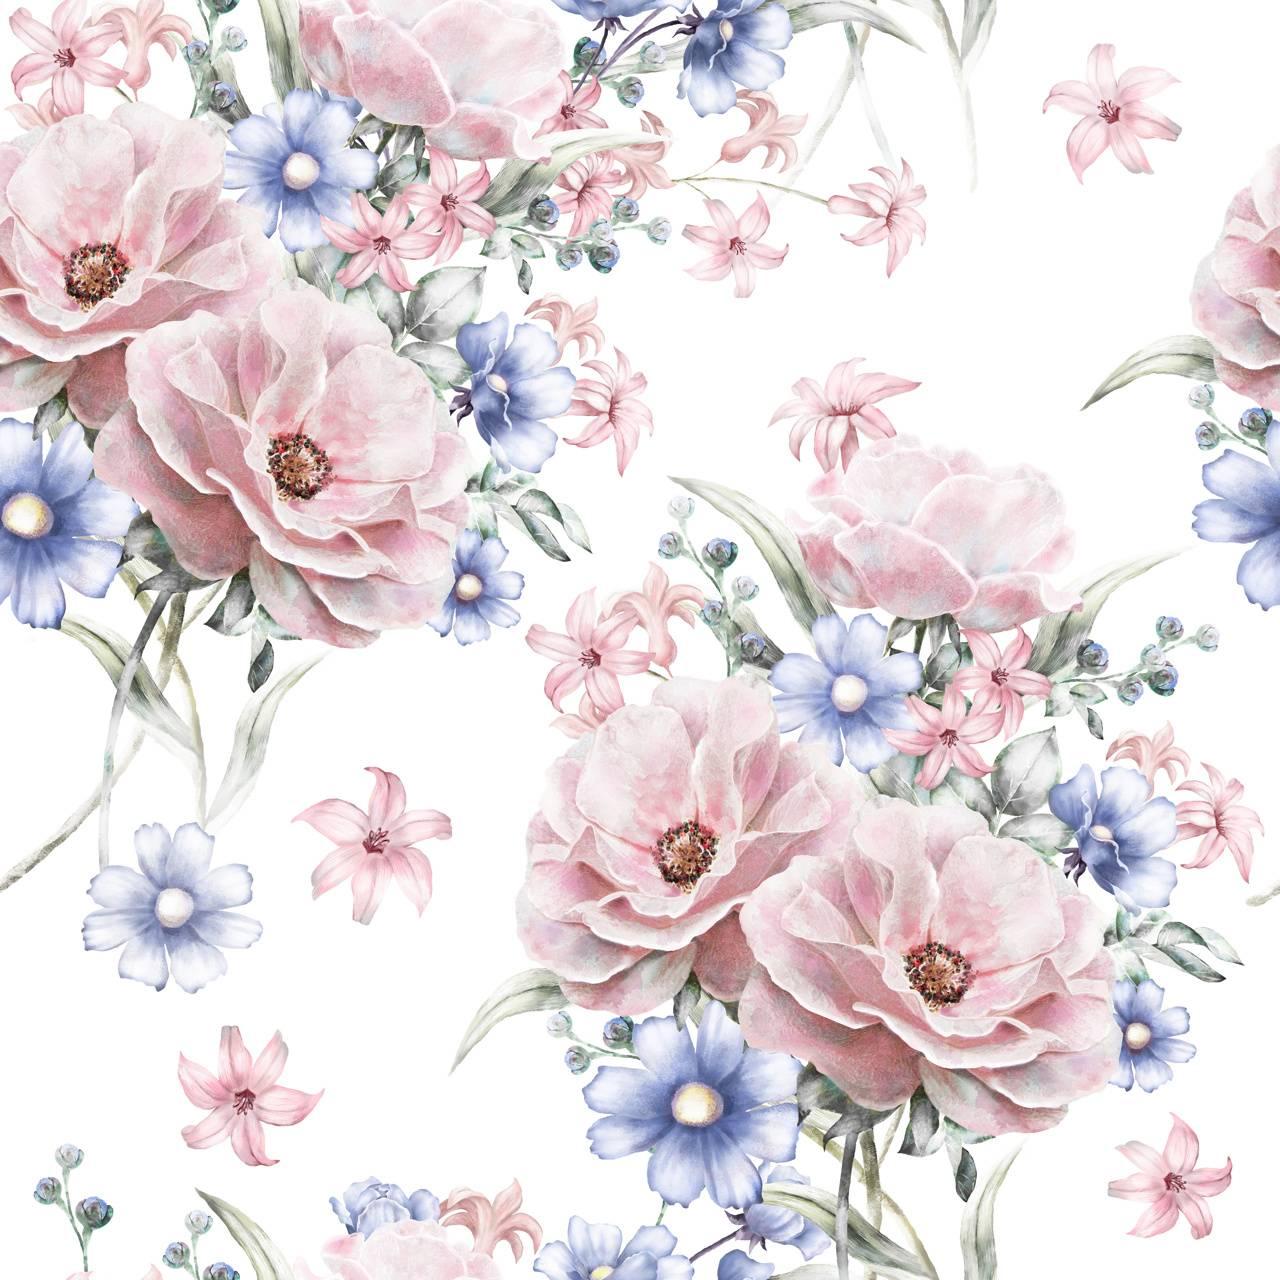 Vintage Flowers wallpaper by iridak1 - b7 - Free on ZEDGE™